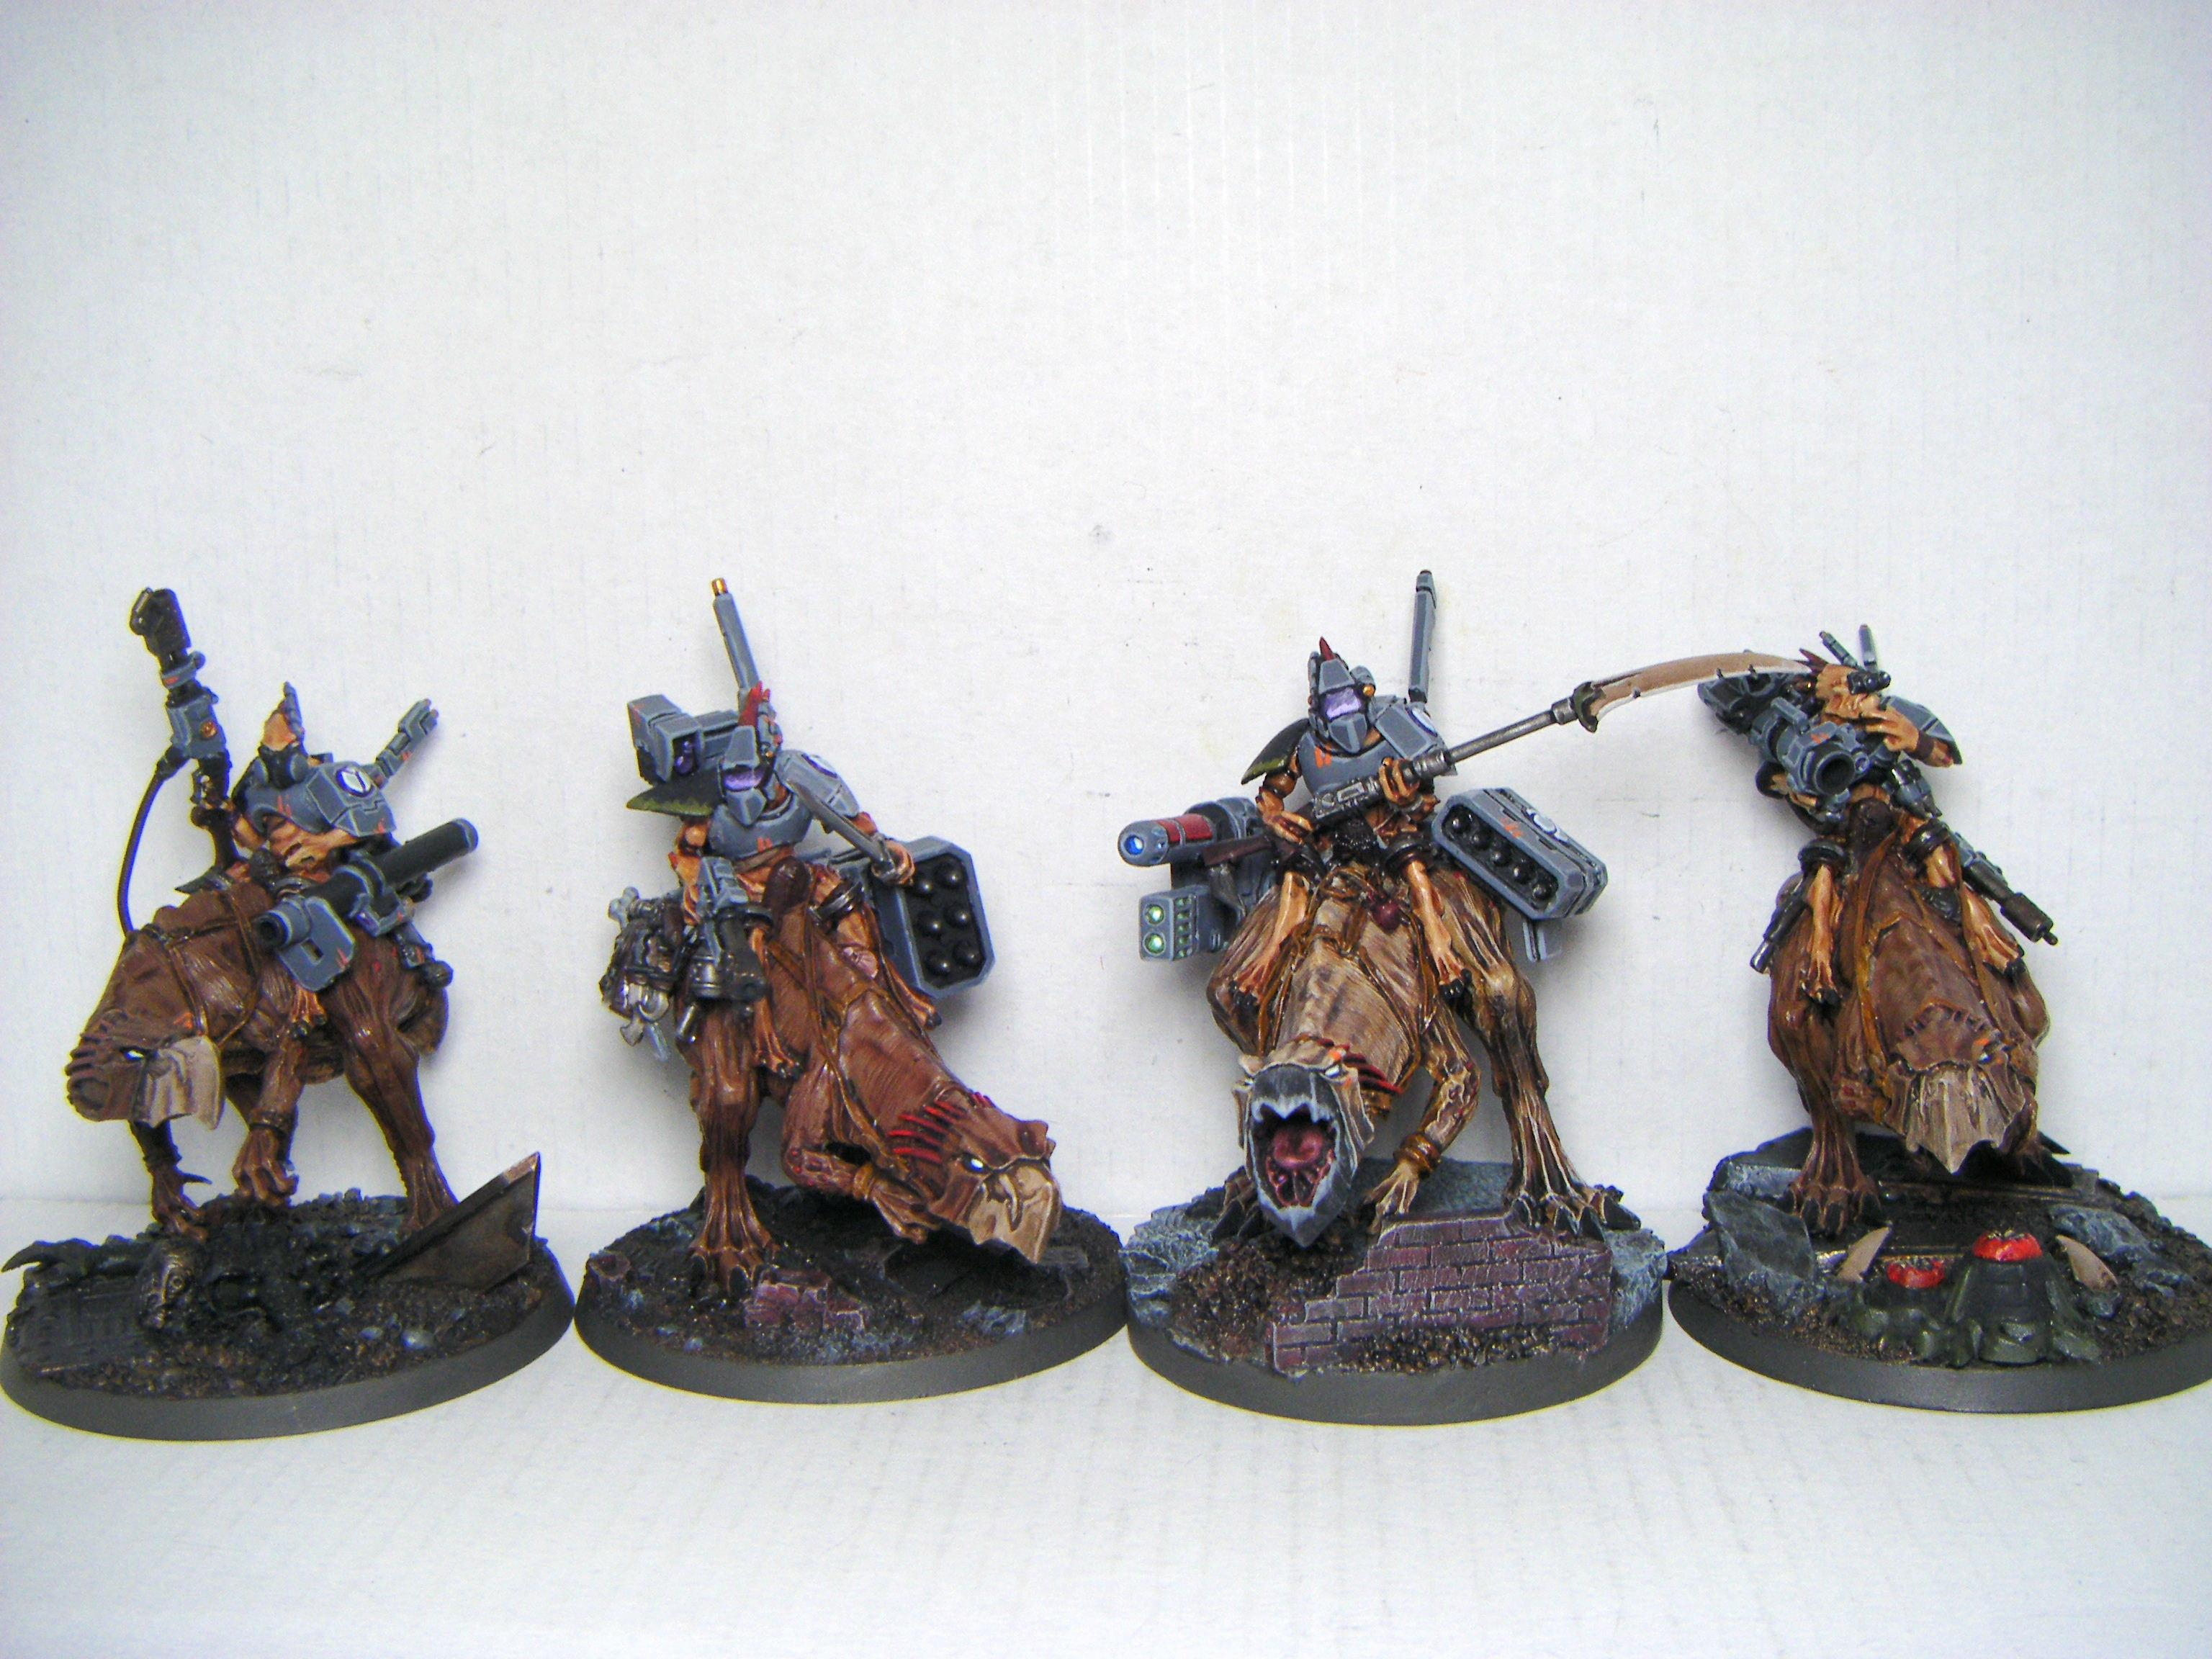 Knarloc, Kroot, Knarloc Riders - Group Shot